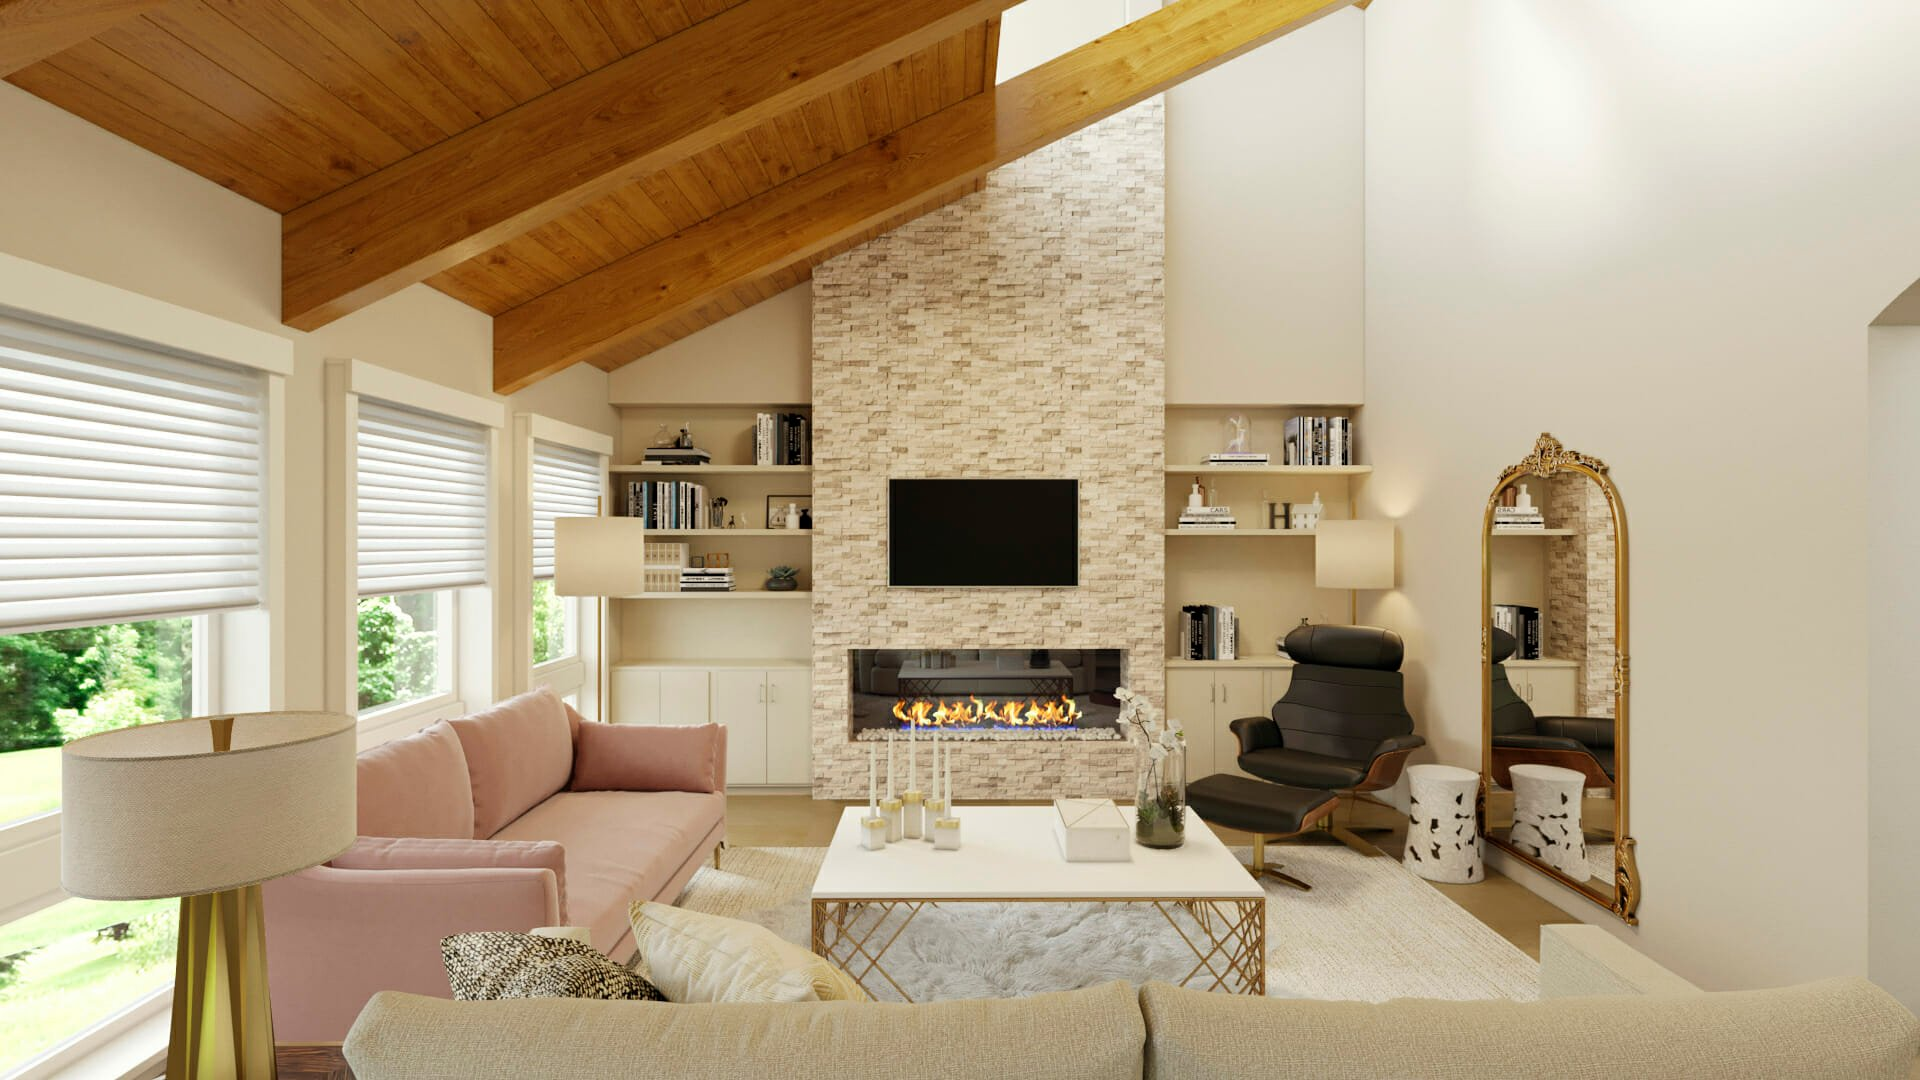 hire an interior designer for my living room - decorilla